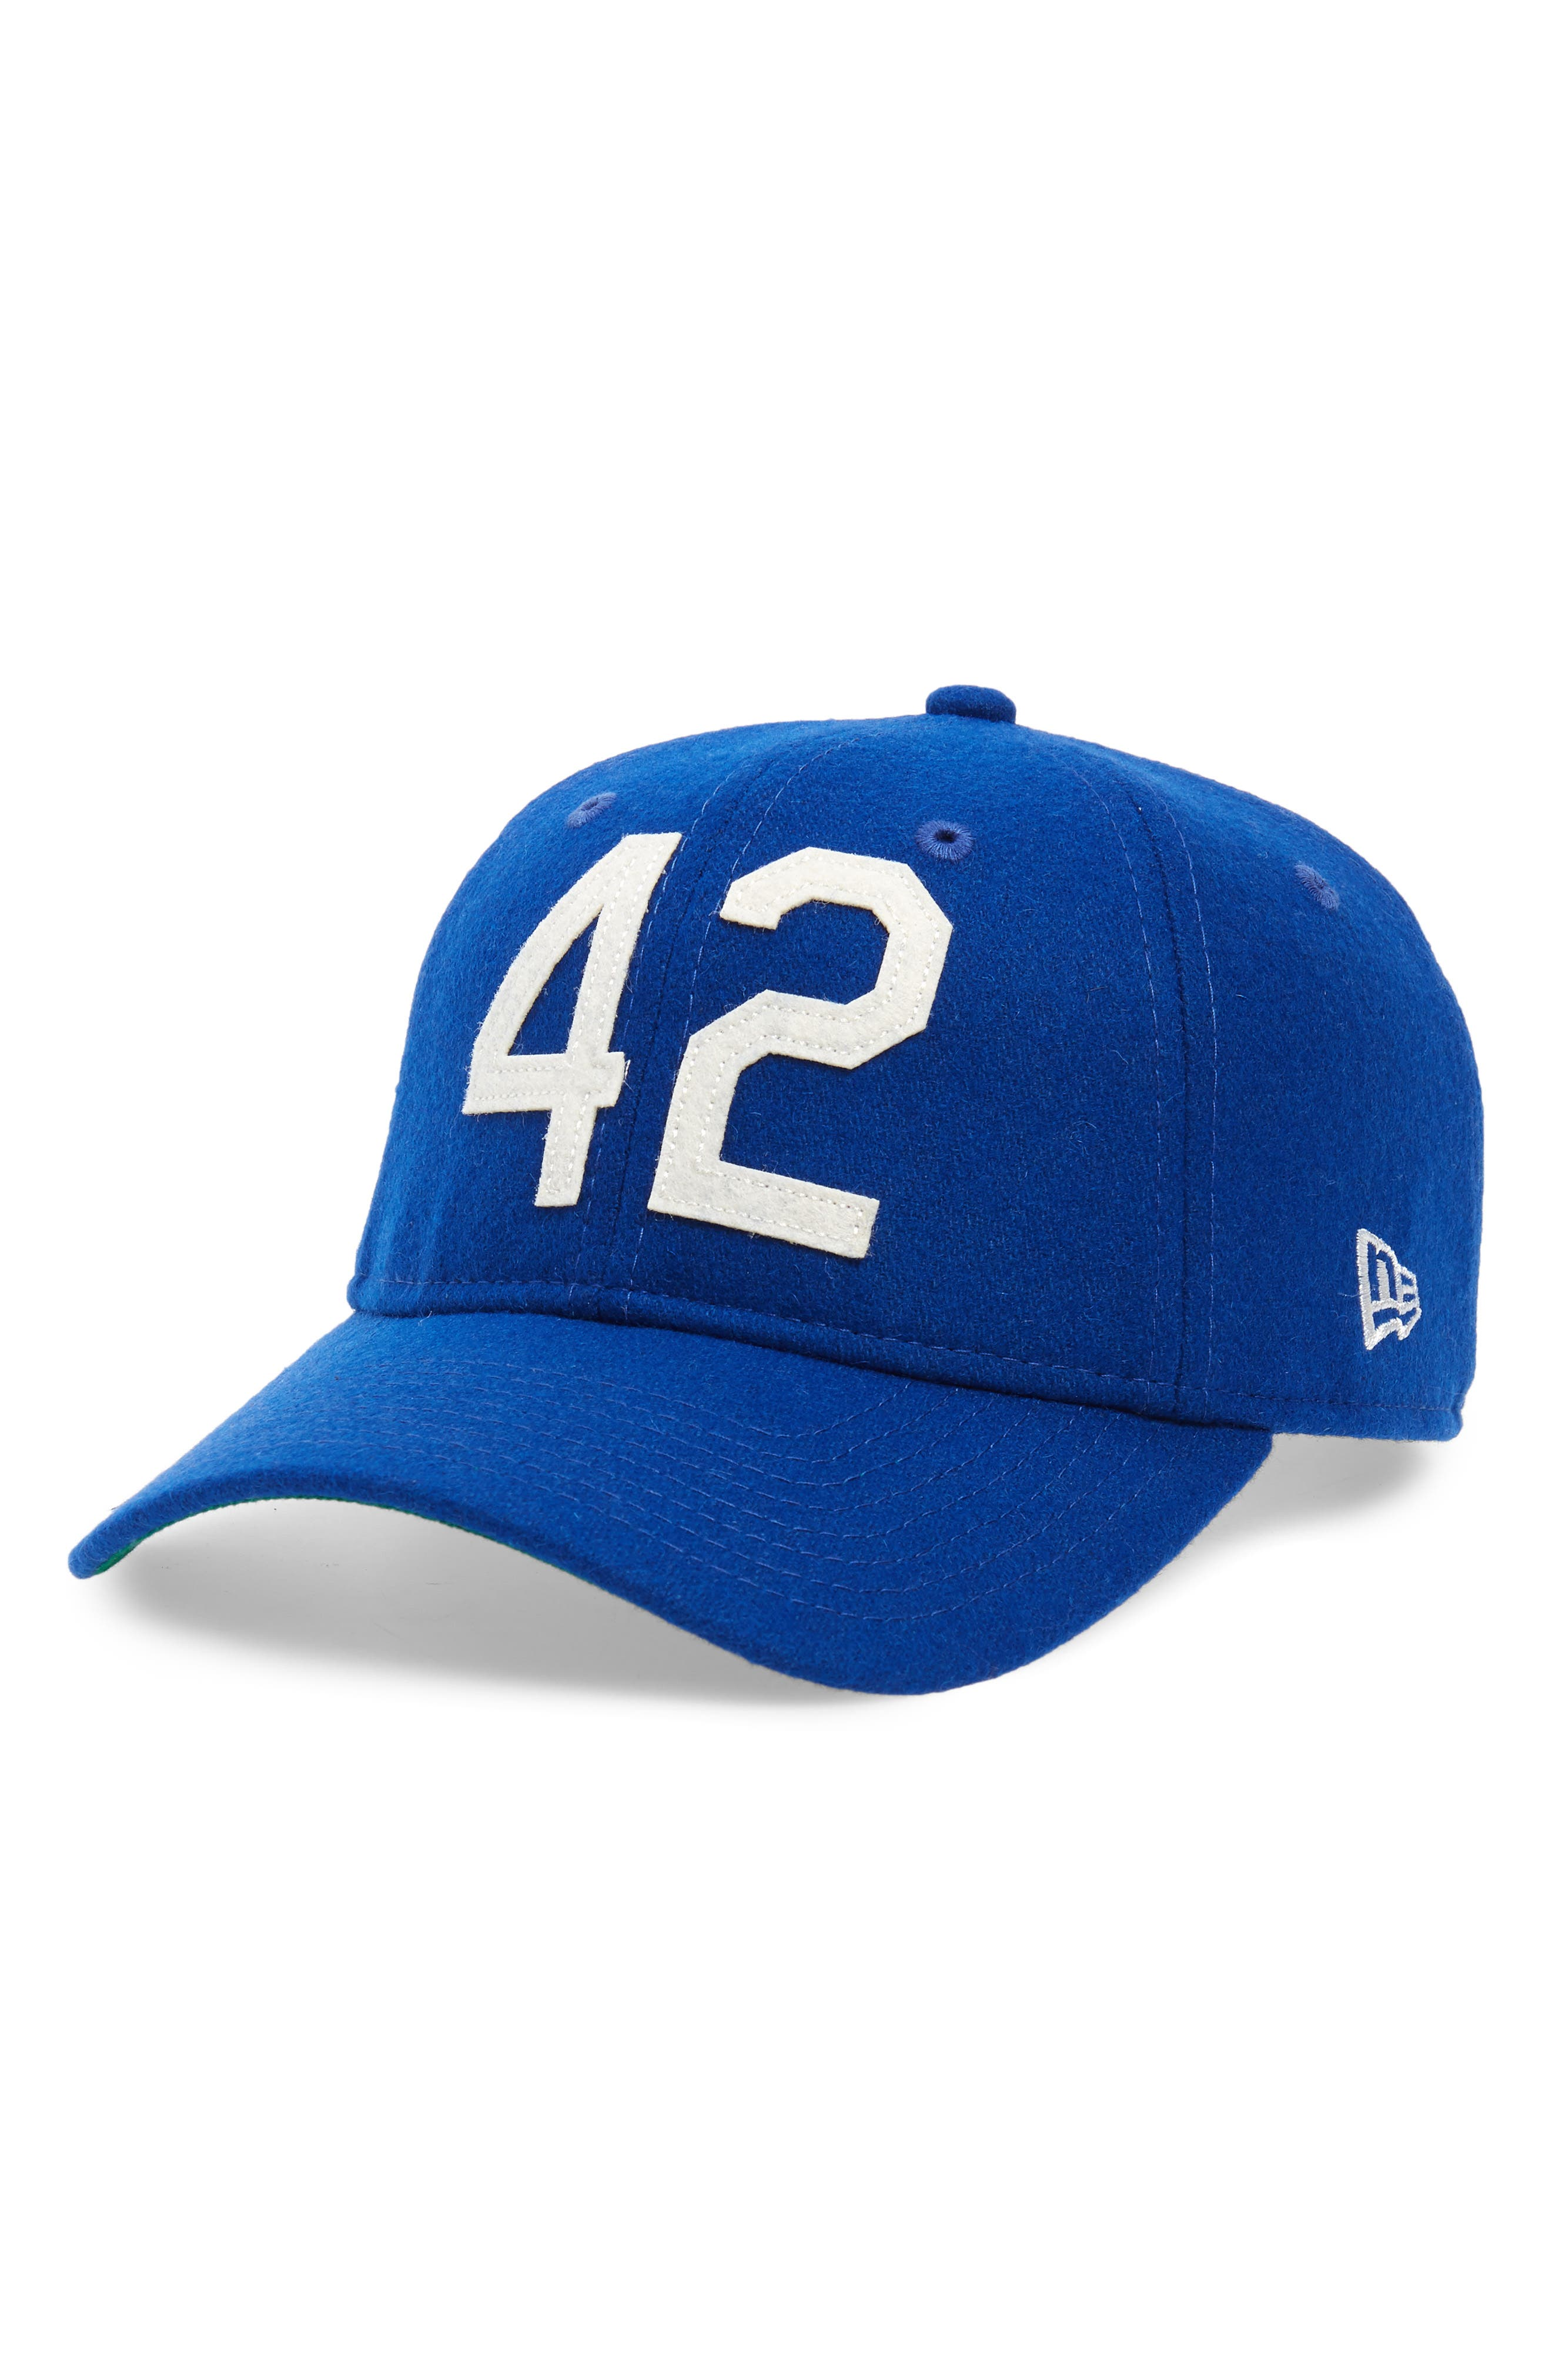 NEW ERA CAP Jackie Robinson 42 9Twenty Wool Blend Baseball Cap, Main, color, 400